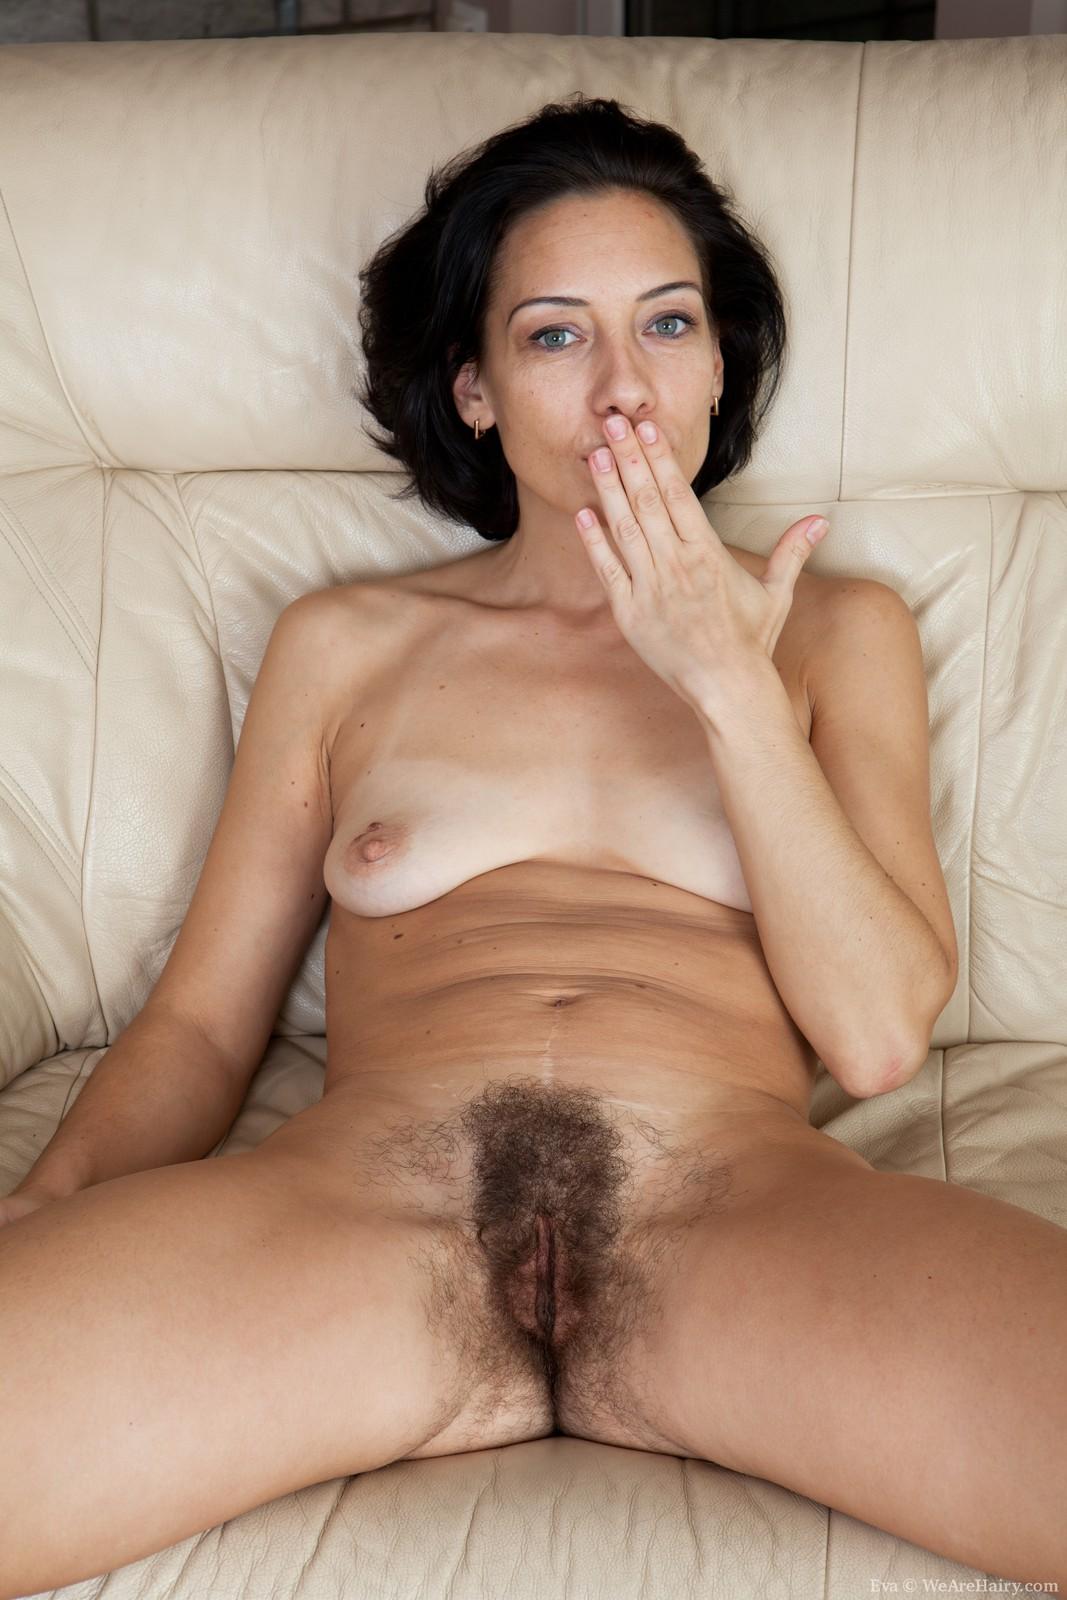 After bigger dick does get masturbation